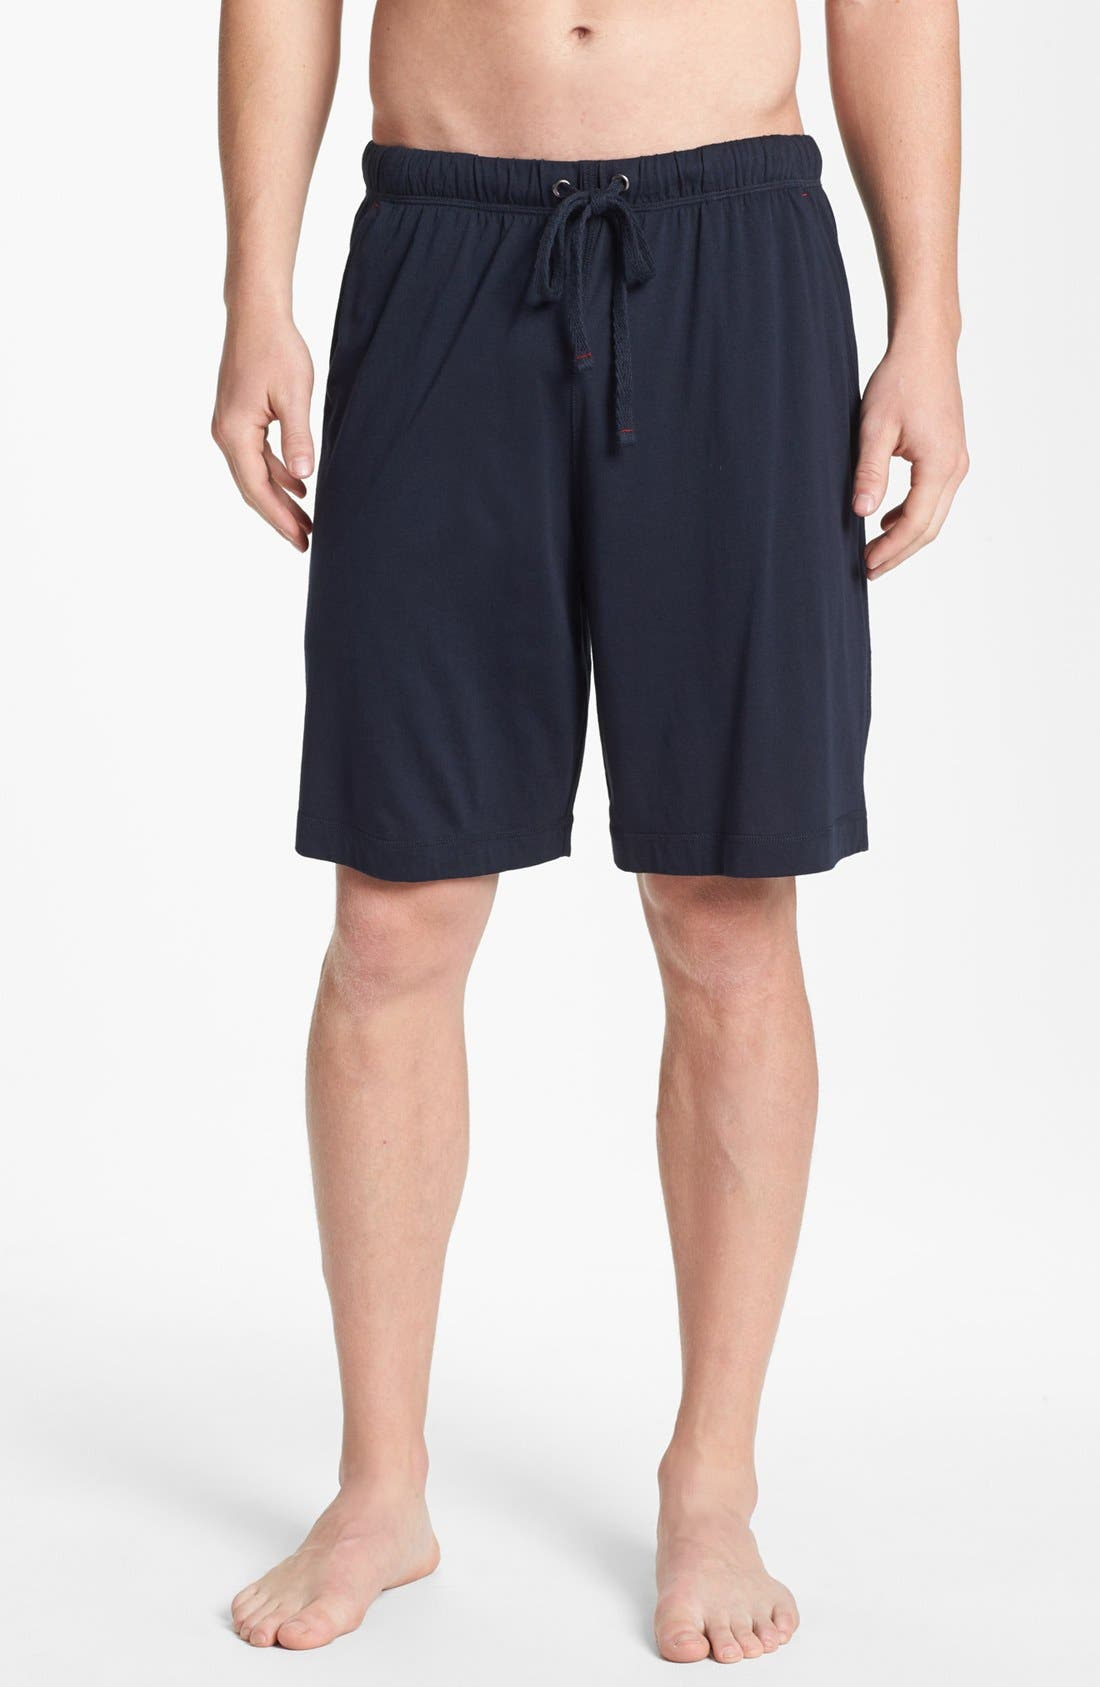 Alternate Image 1 Selected - Daniel Buchler Cotton/Modal Shorts